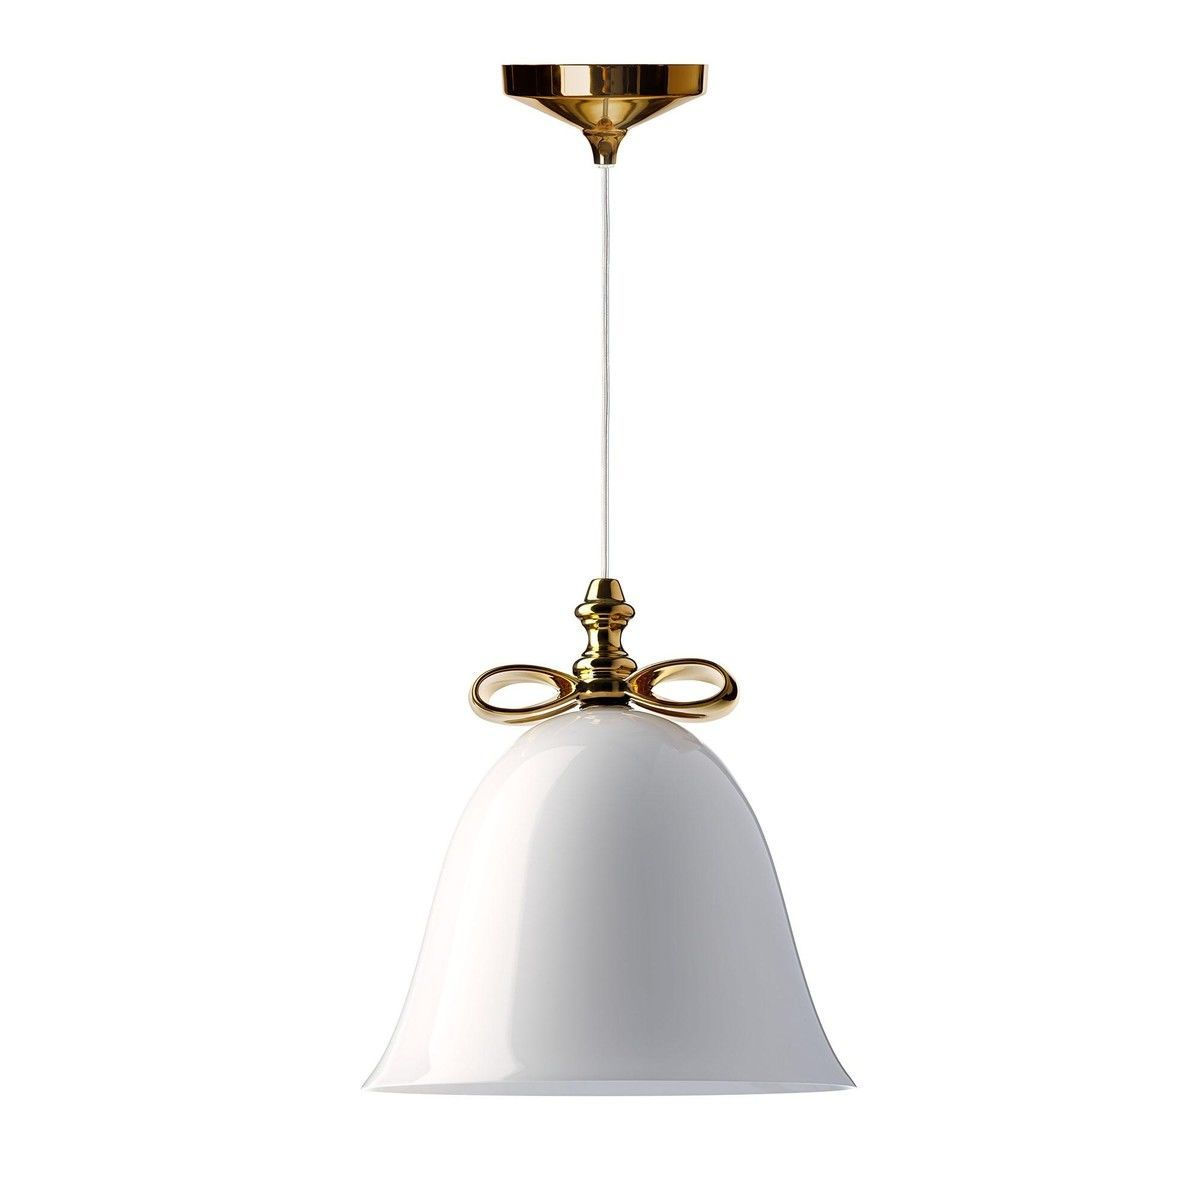 Bell Lamp Suspension Lamp | Moooi | AmbienteDirect.com